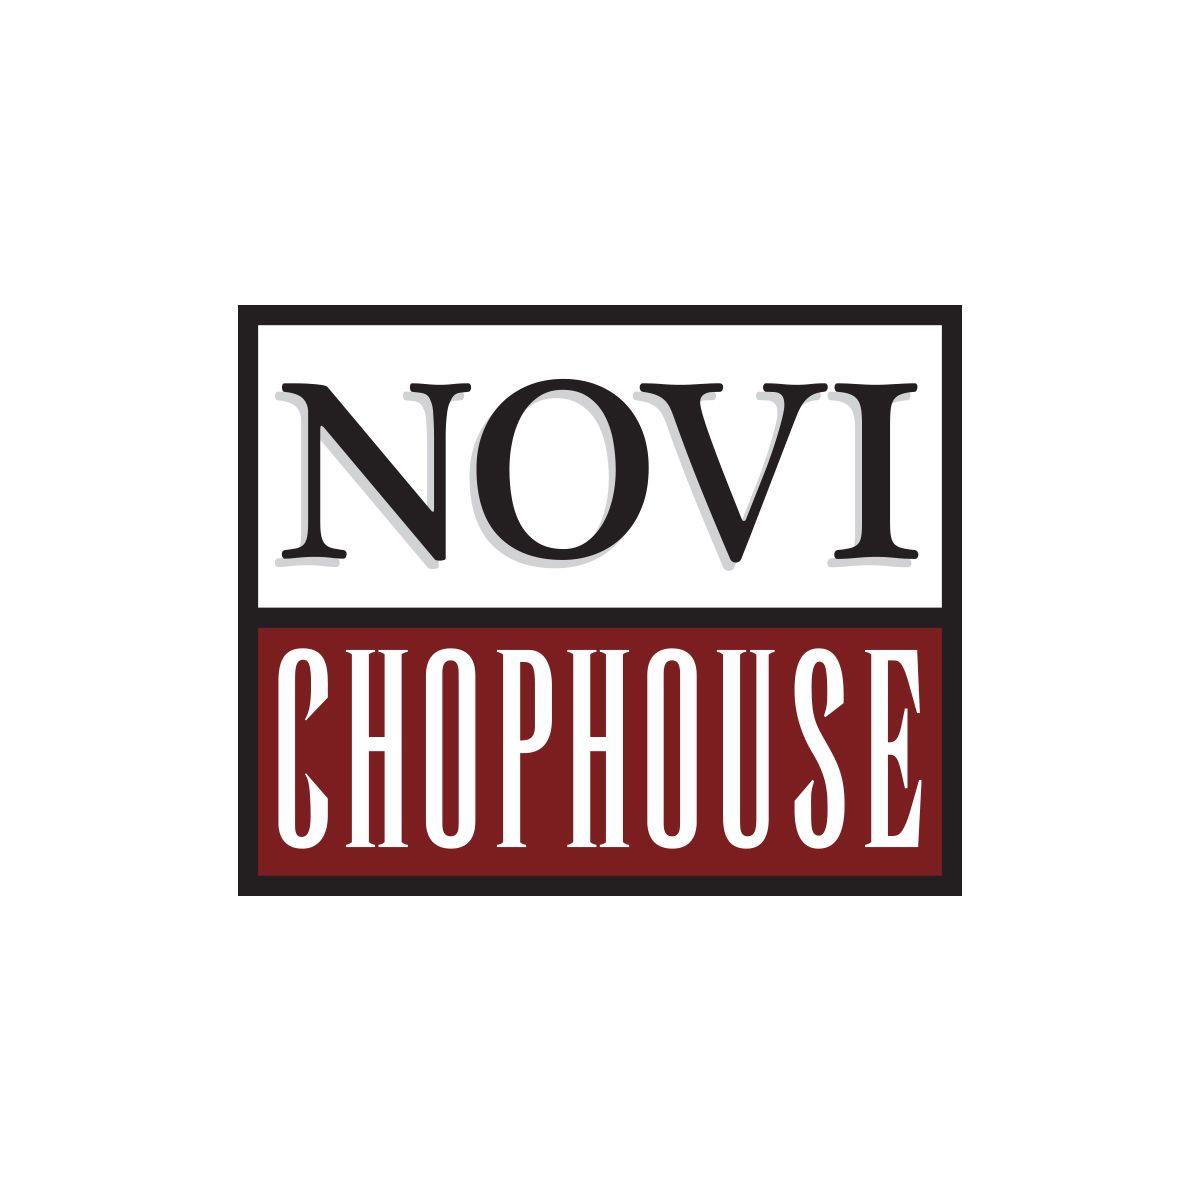 NoviChophouse-TOL-2019